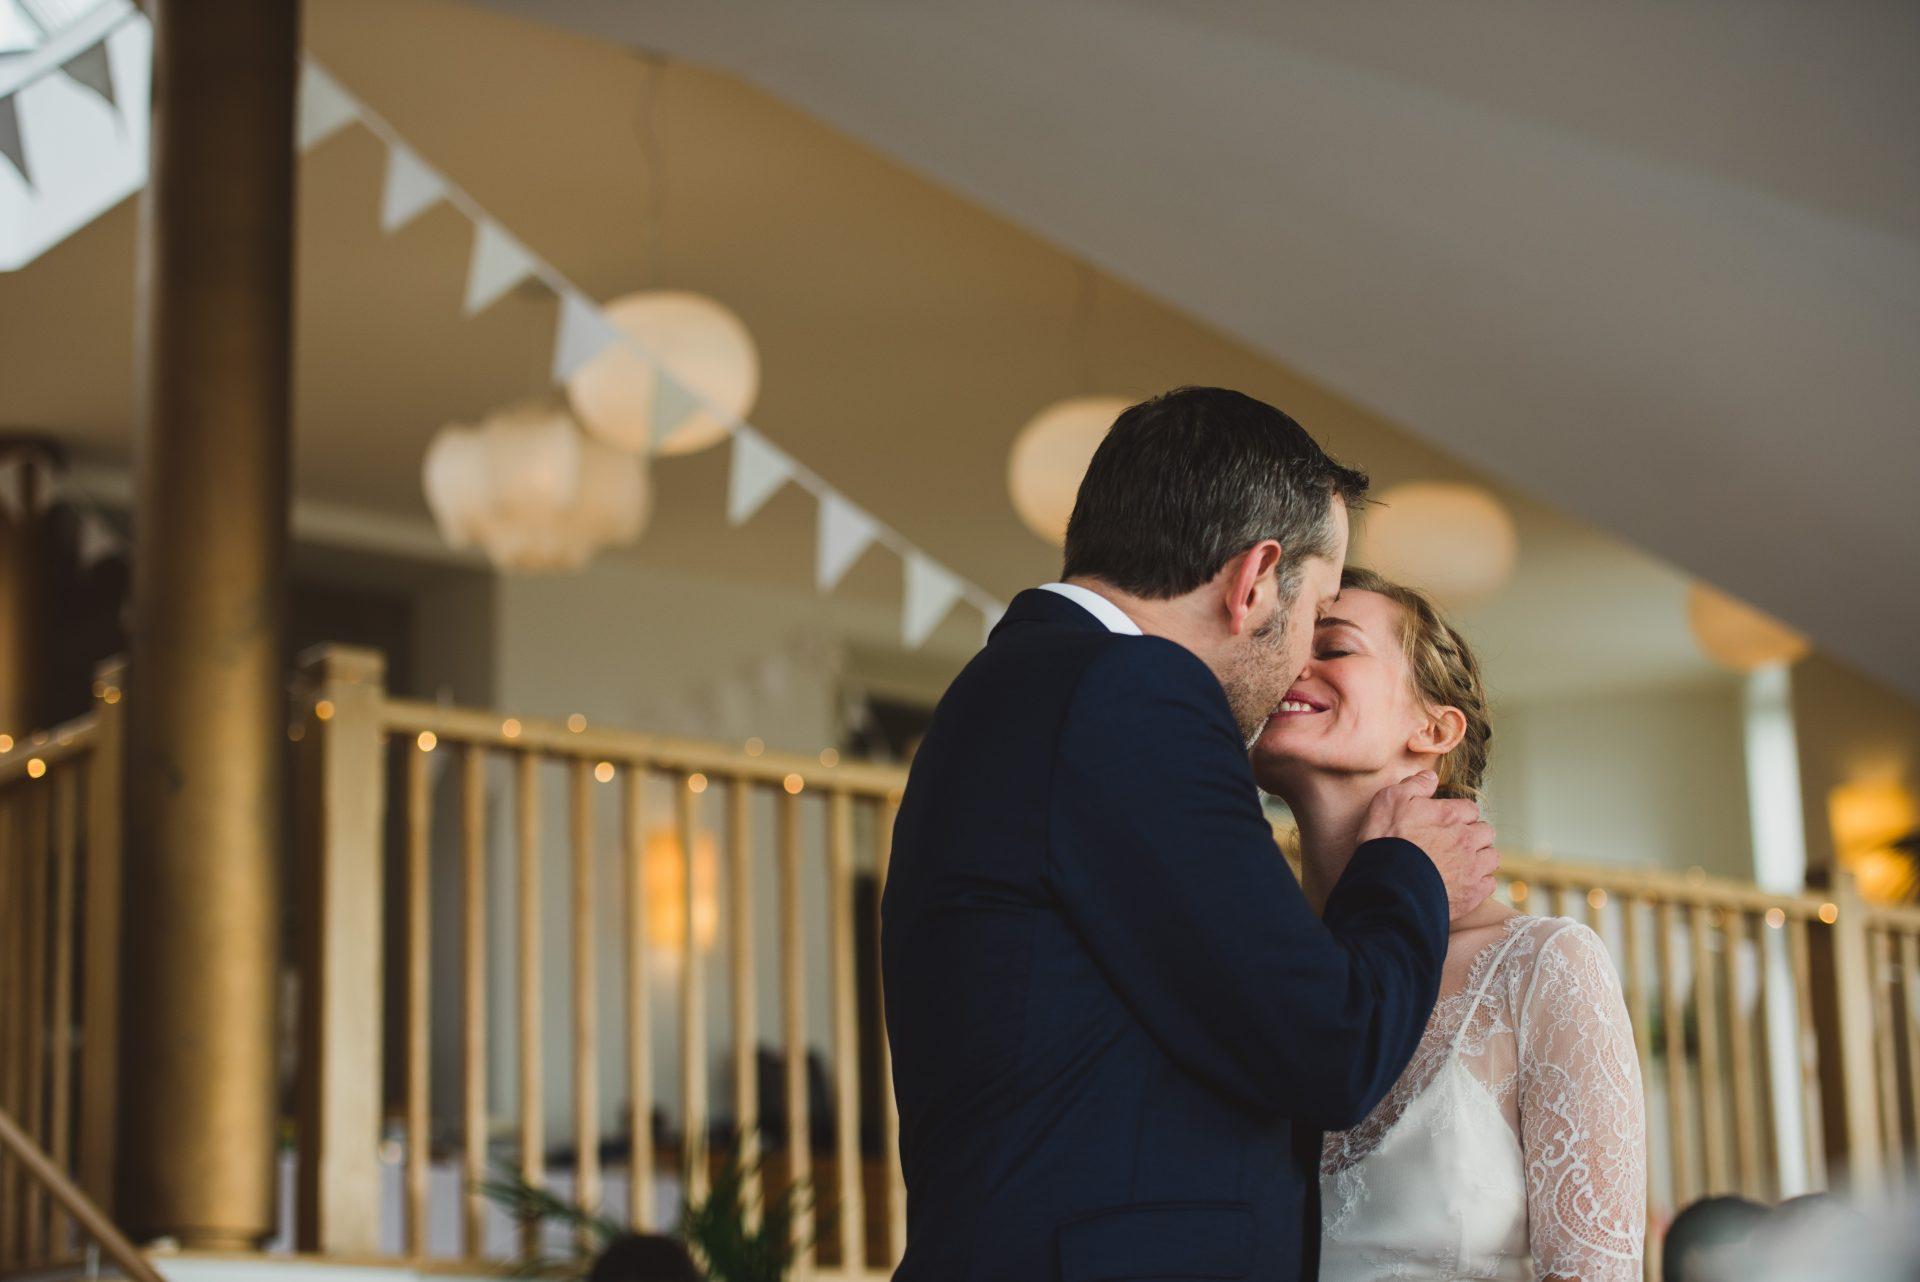 Polurrian Hotel Wedding - Stewart Girvan Photography